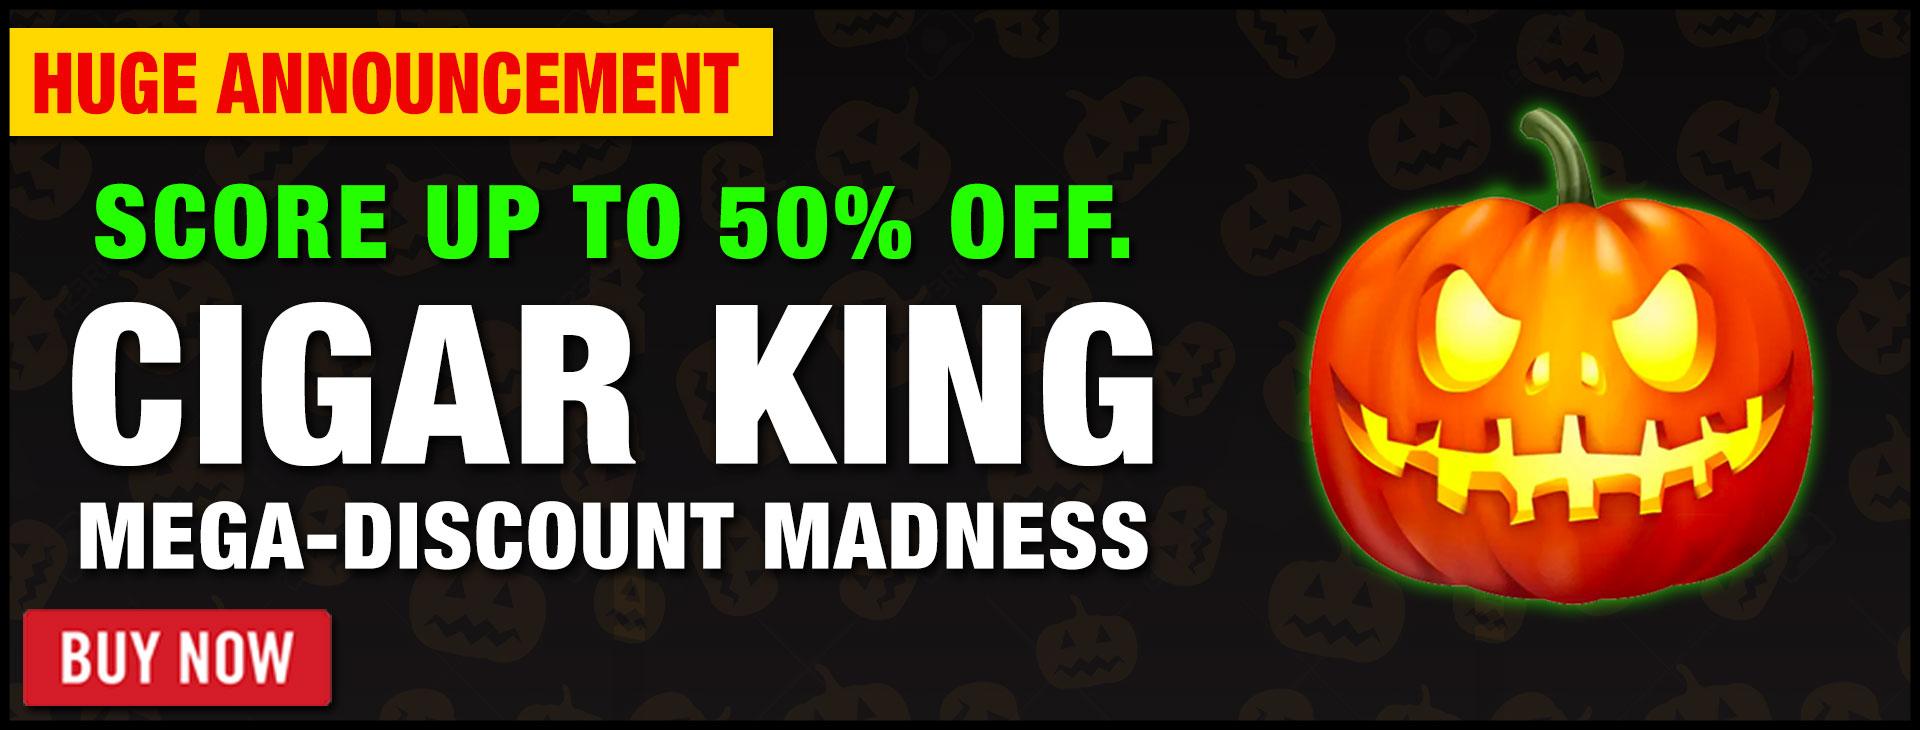 halloween-cigar-king-mega-discount-madness-2020-banner.jpg